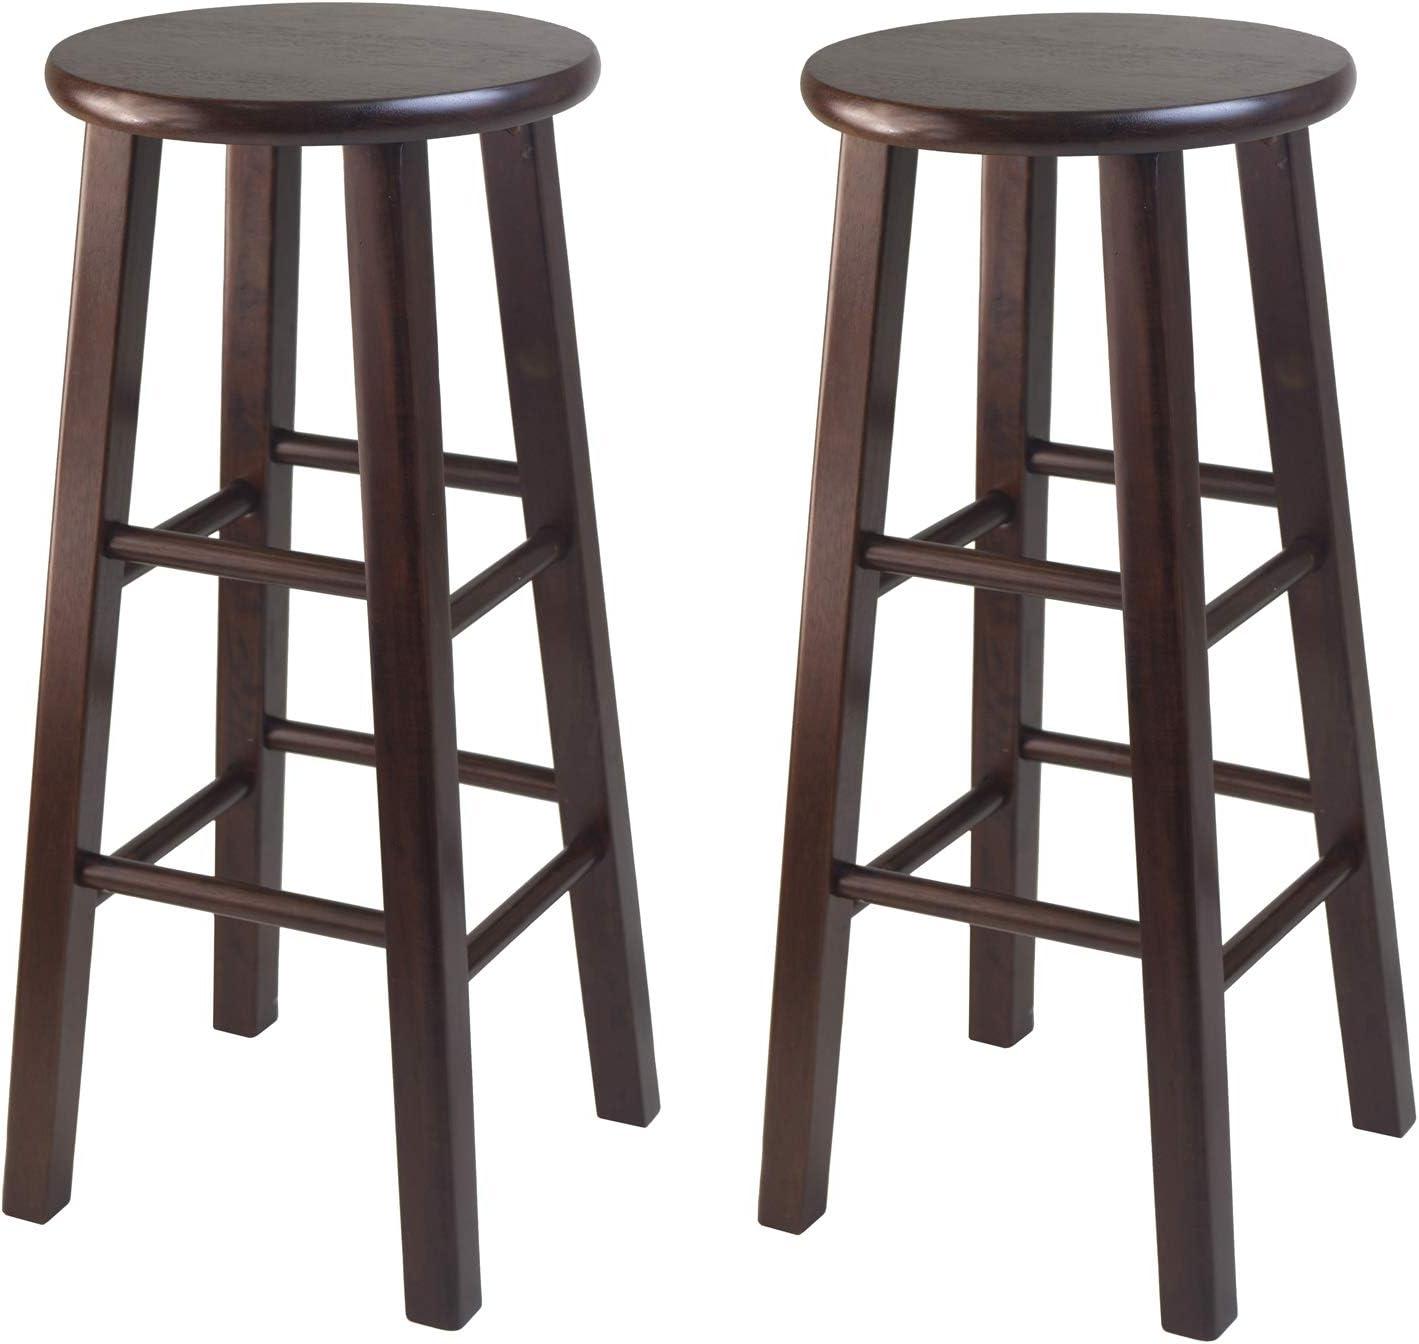 5. Winsome 29-Inch Square Leg Bar Stool